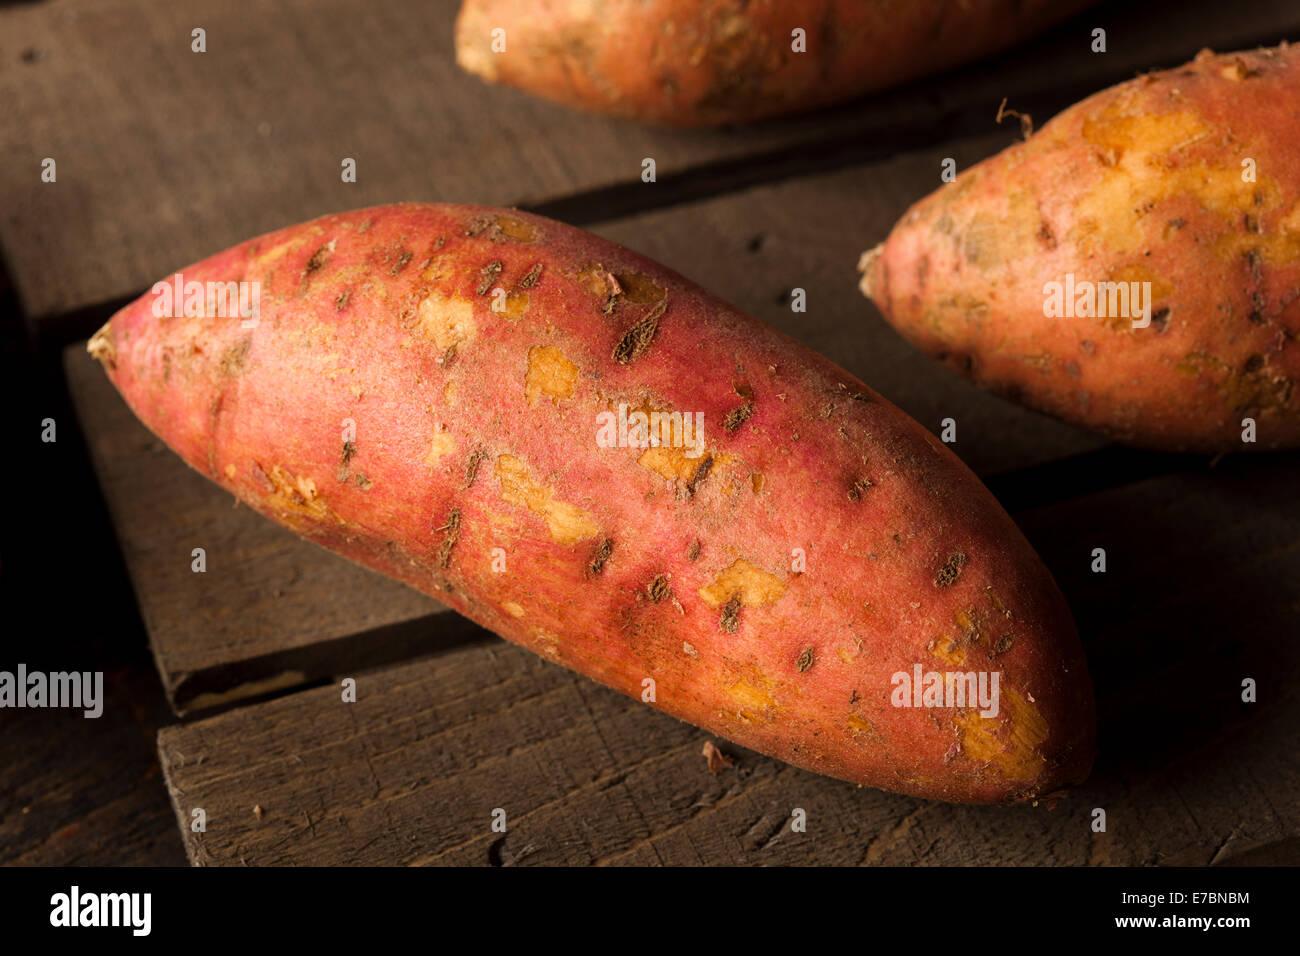 Organic Raw Sweet Potatoes on a Background - Stock Image